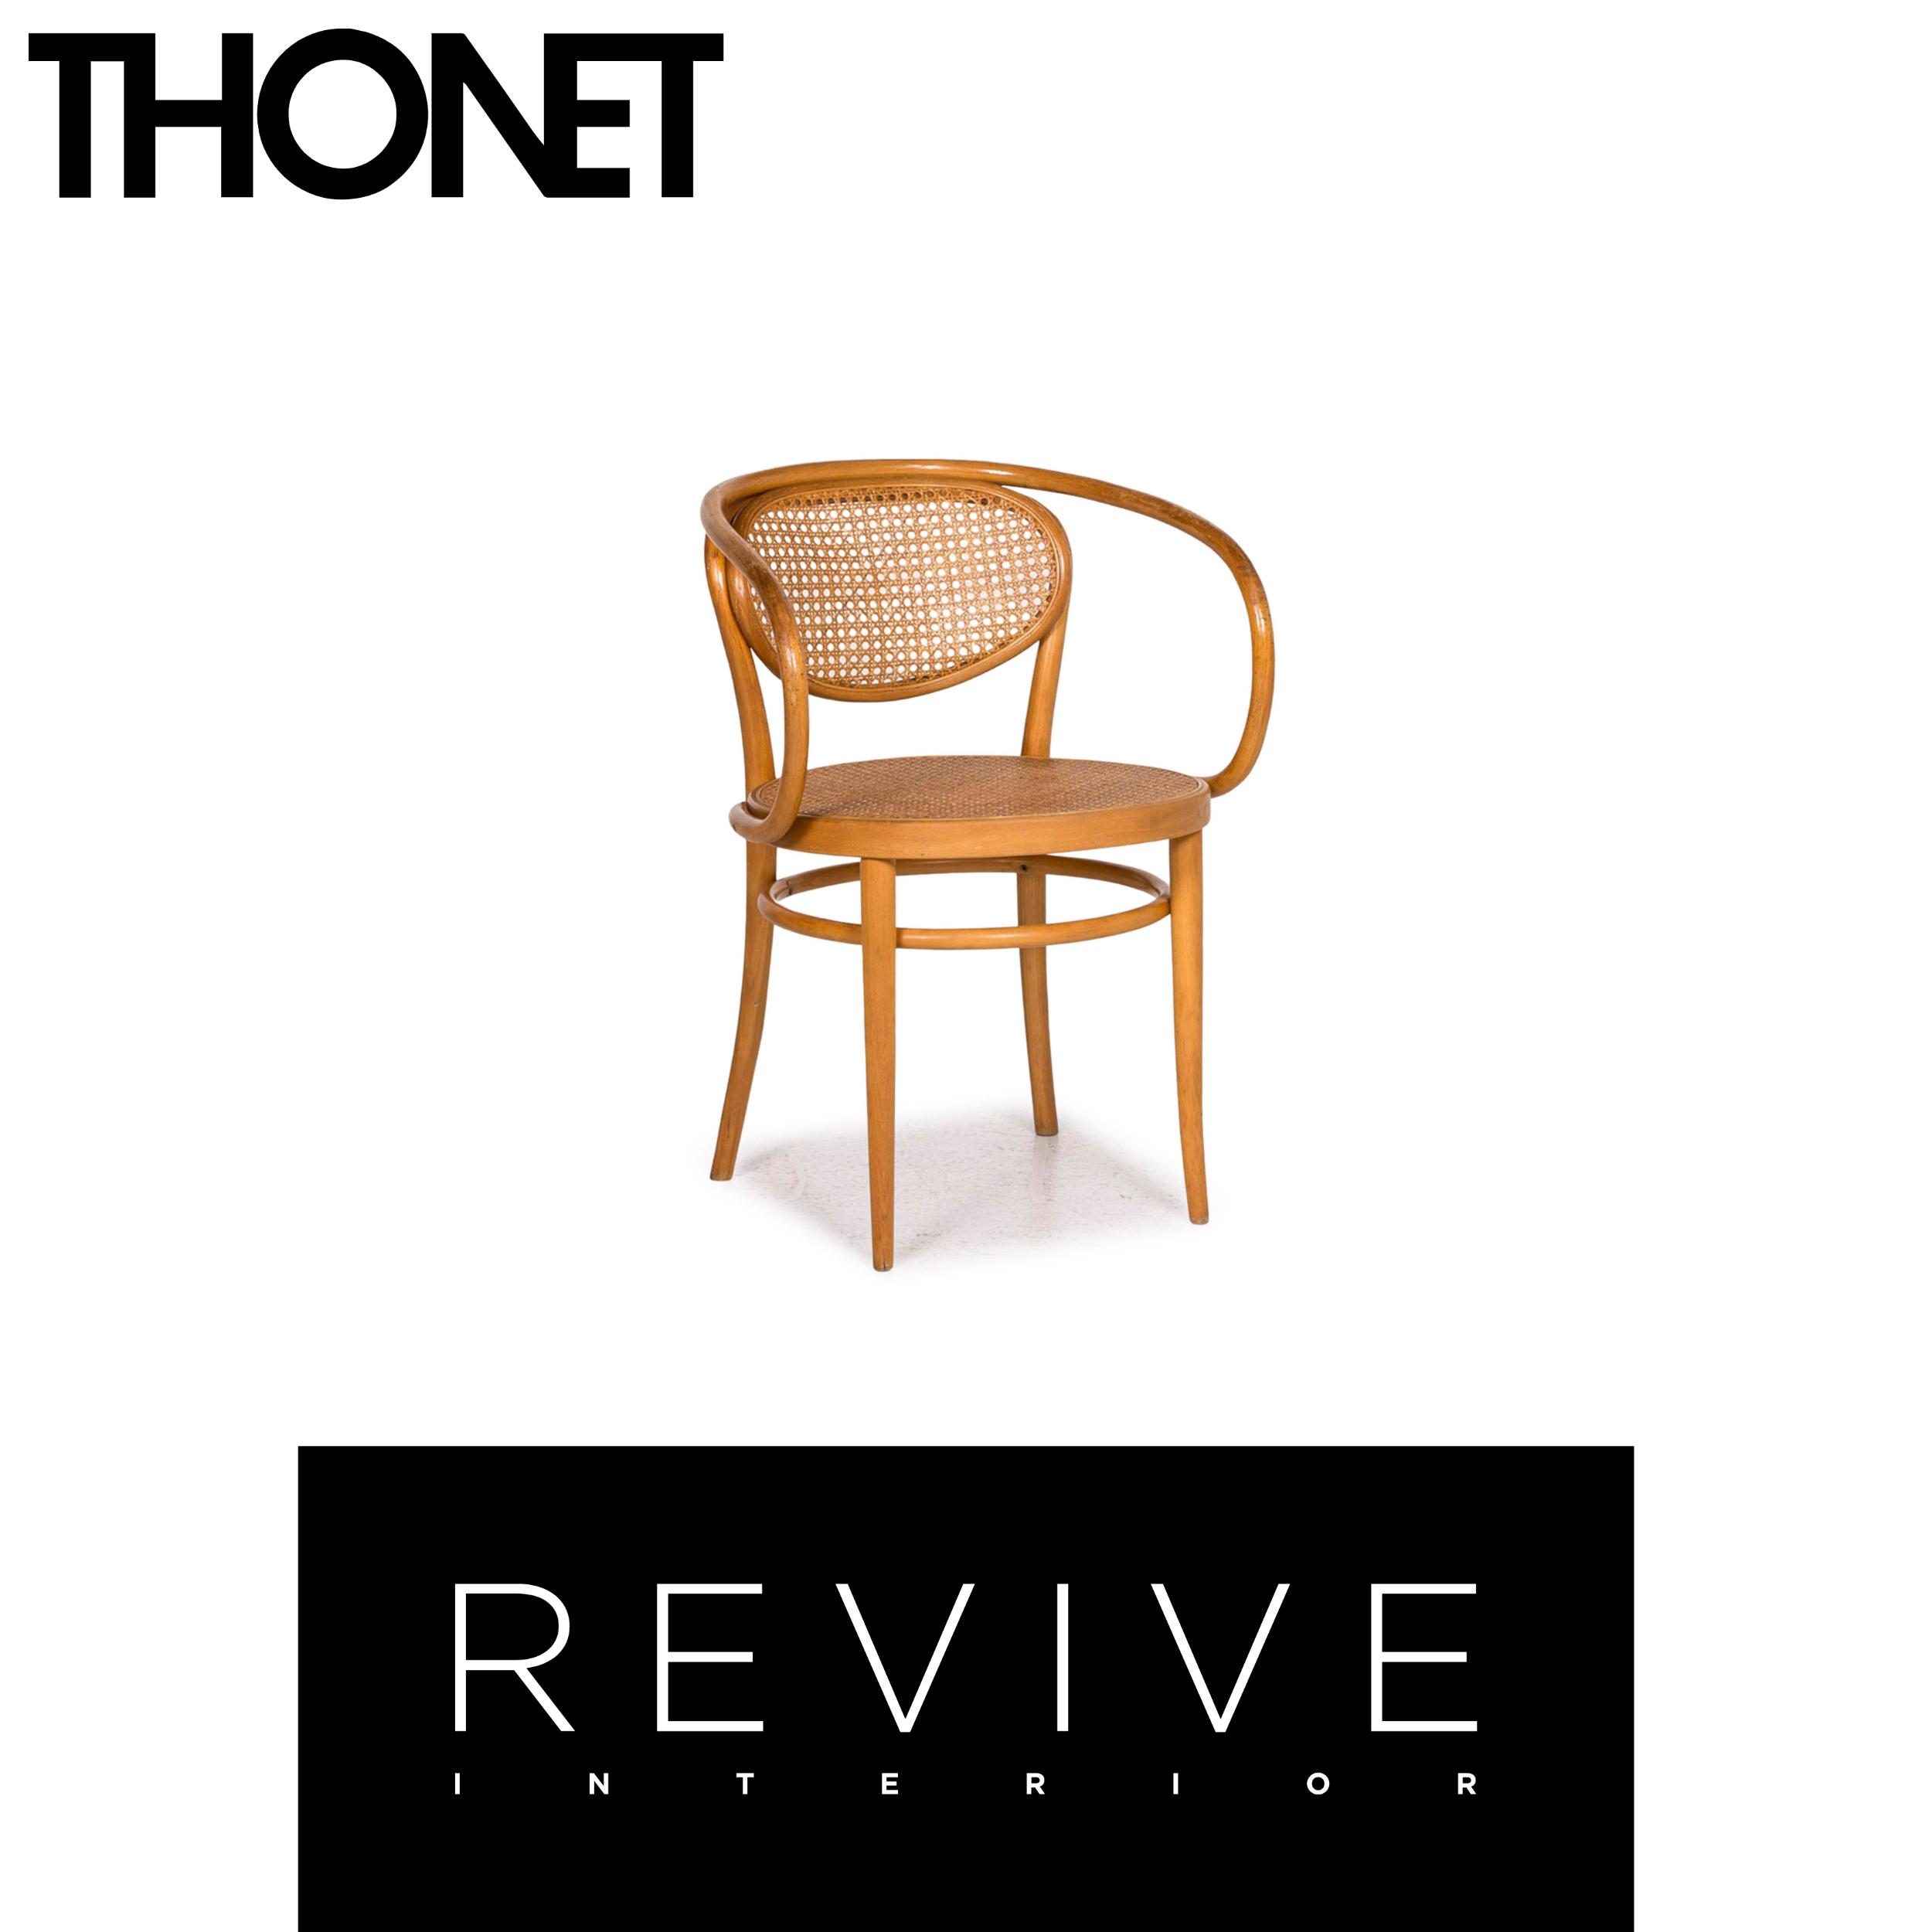 Thonet 210r Holz Stuhl Wiener Geflecht 12354 Ebay